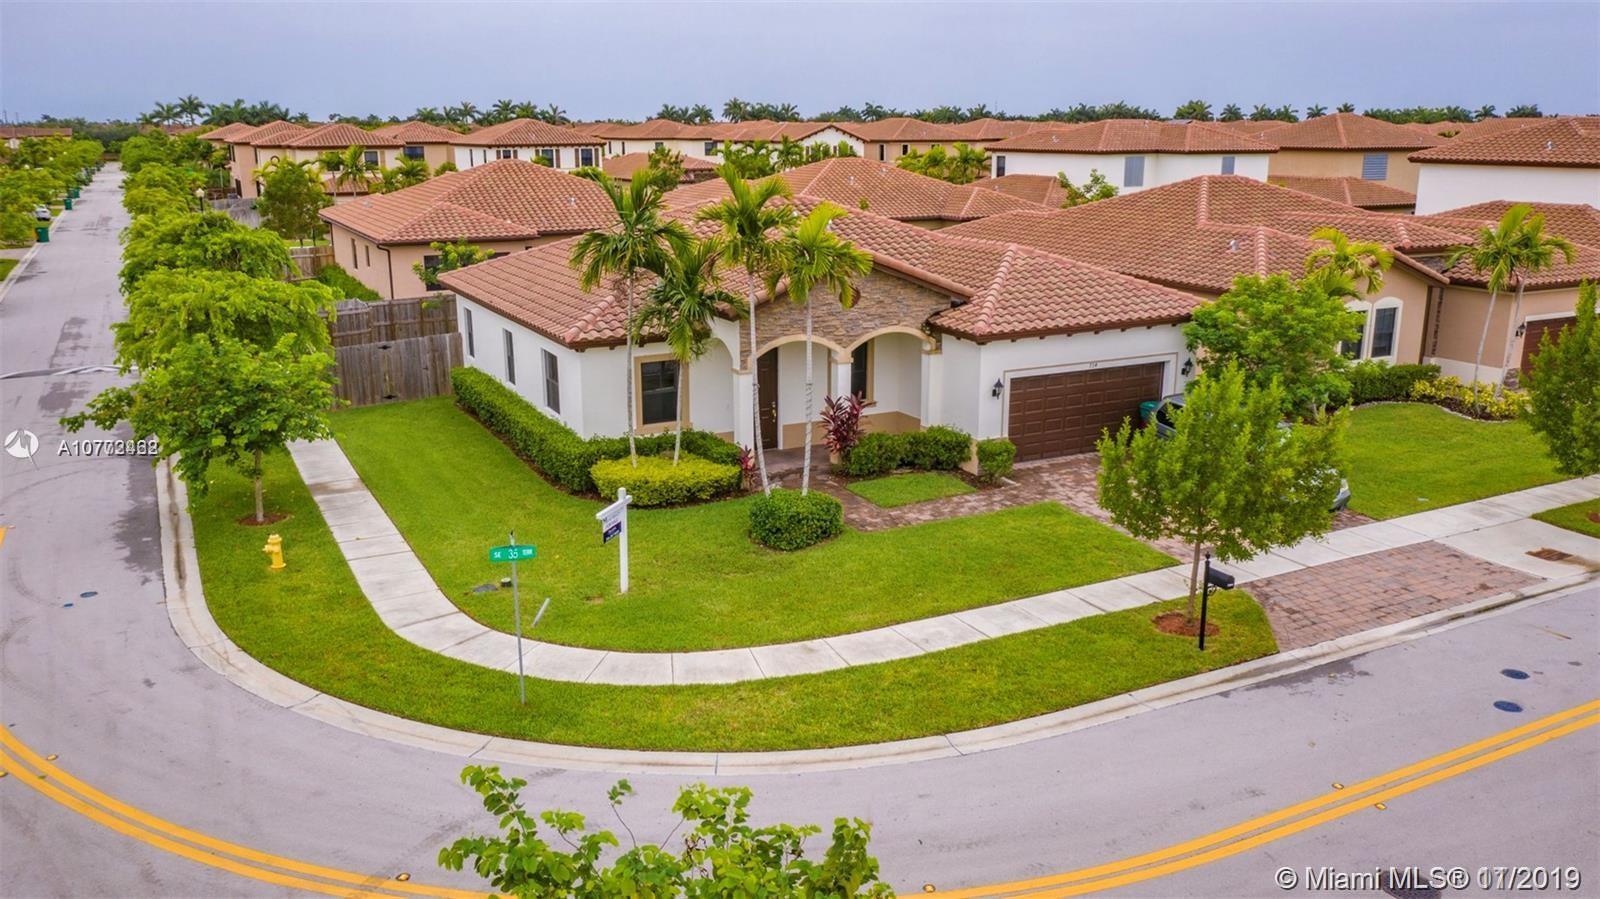 734 SE 35th Ter, Homestead, FL 33033 - Homestead, FL real estate listing